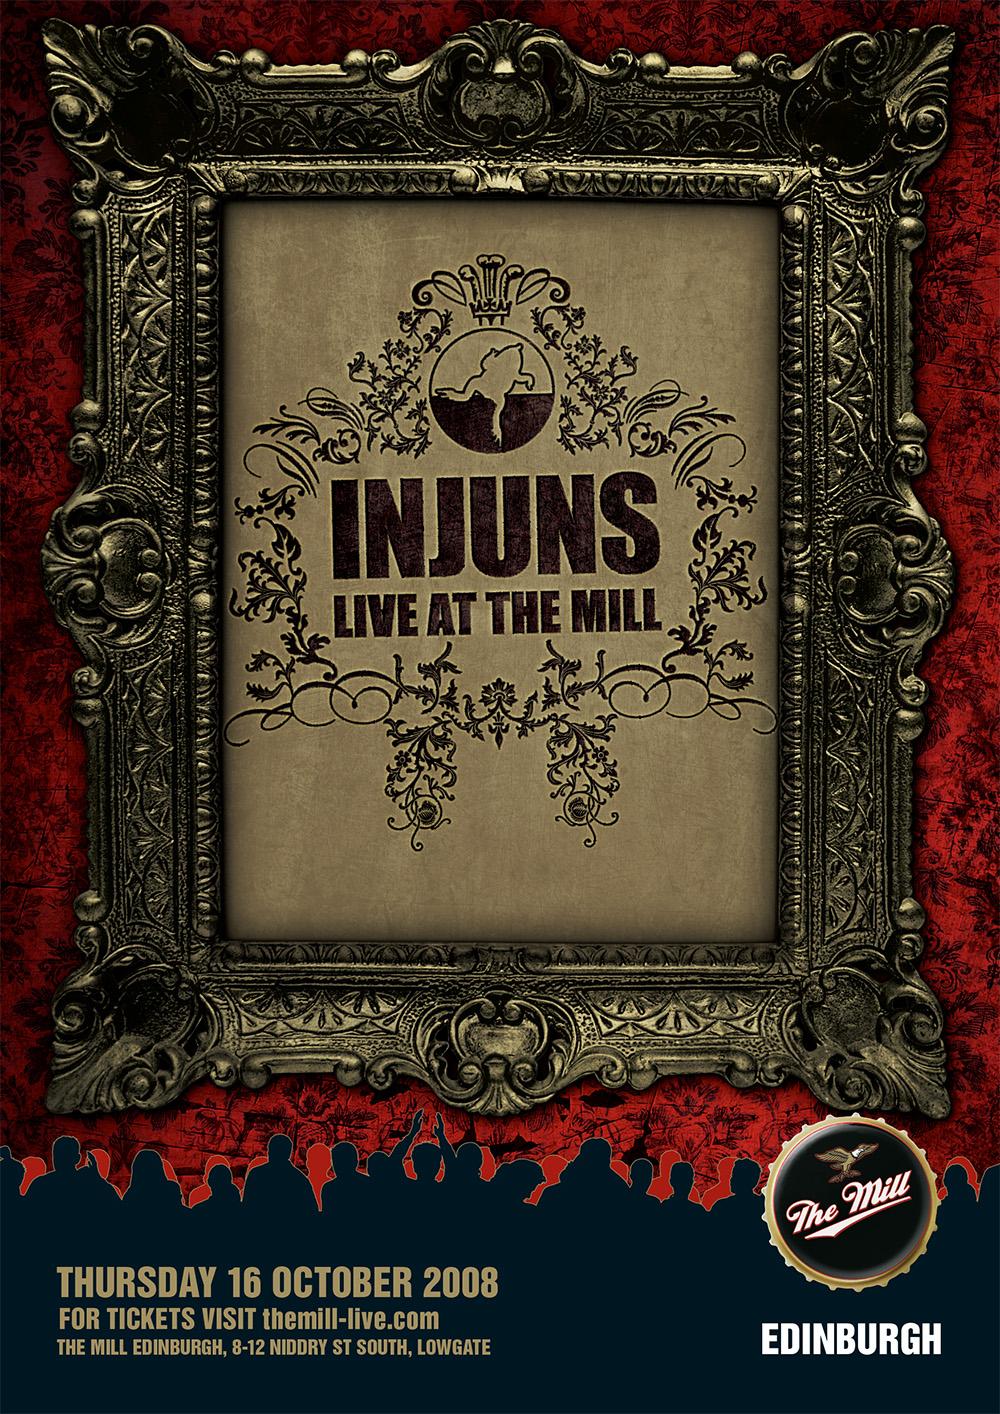 New Injuns Poster copy.jpg